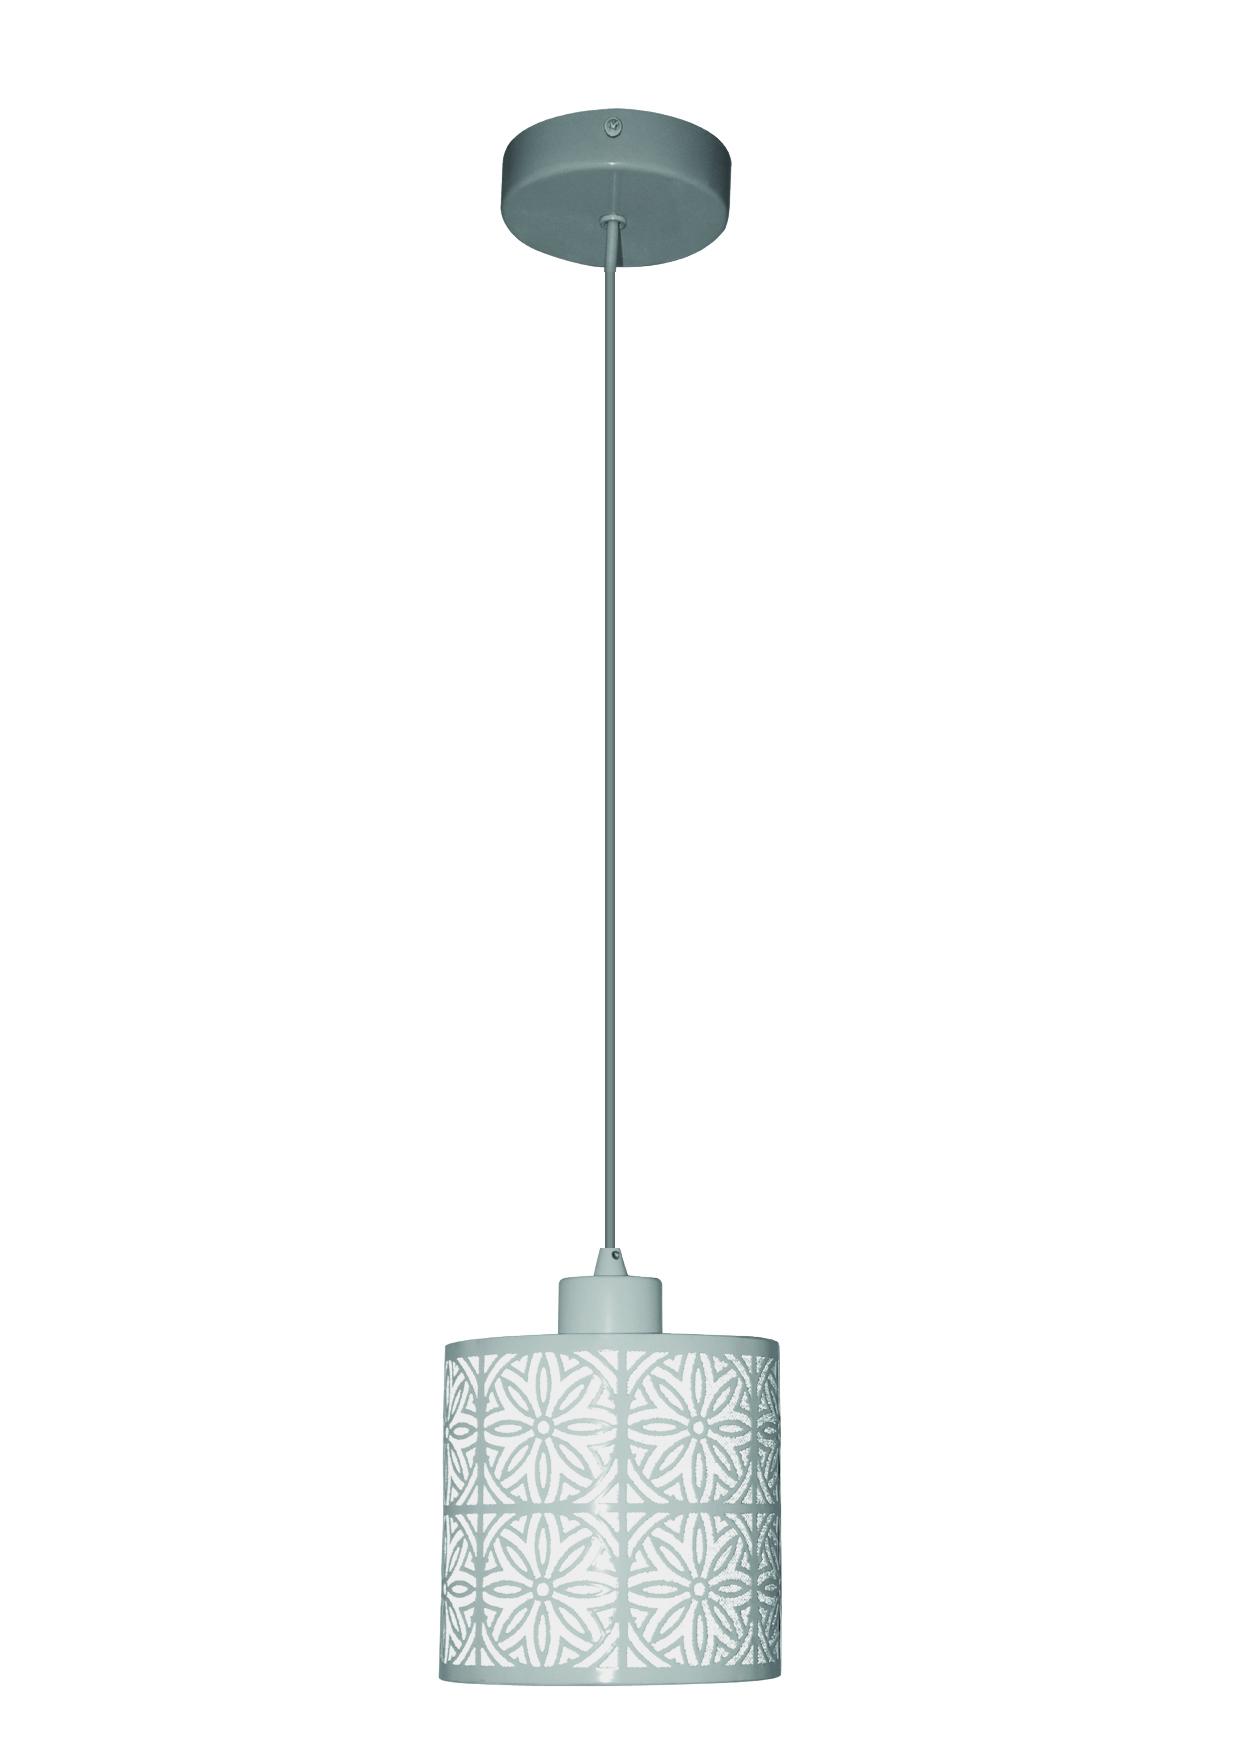 Pendente Vitral 1XE27 Canopla em aço + metal branca Cúpula em PVC branca